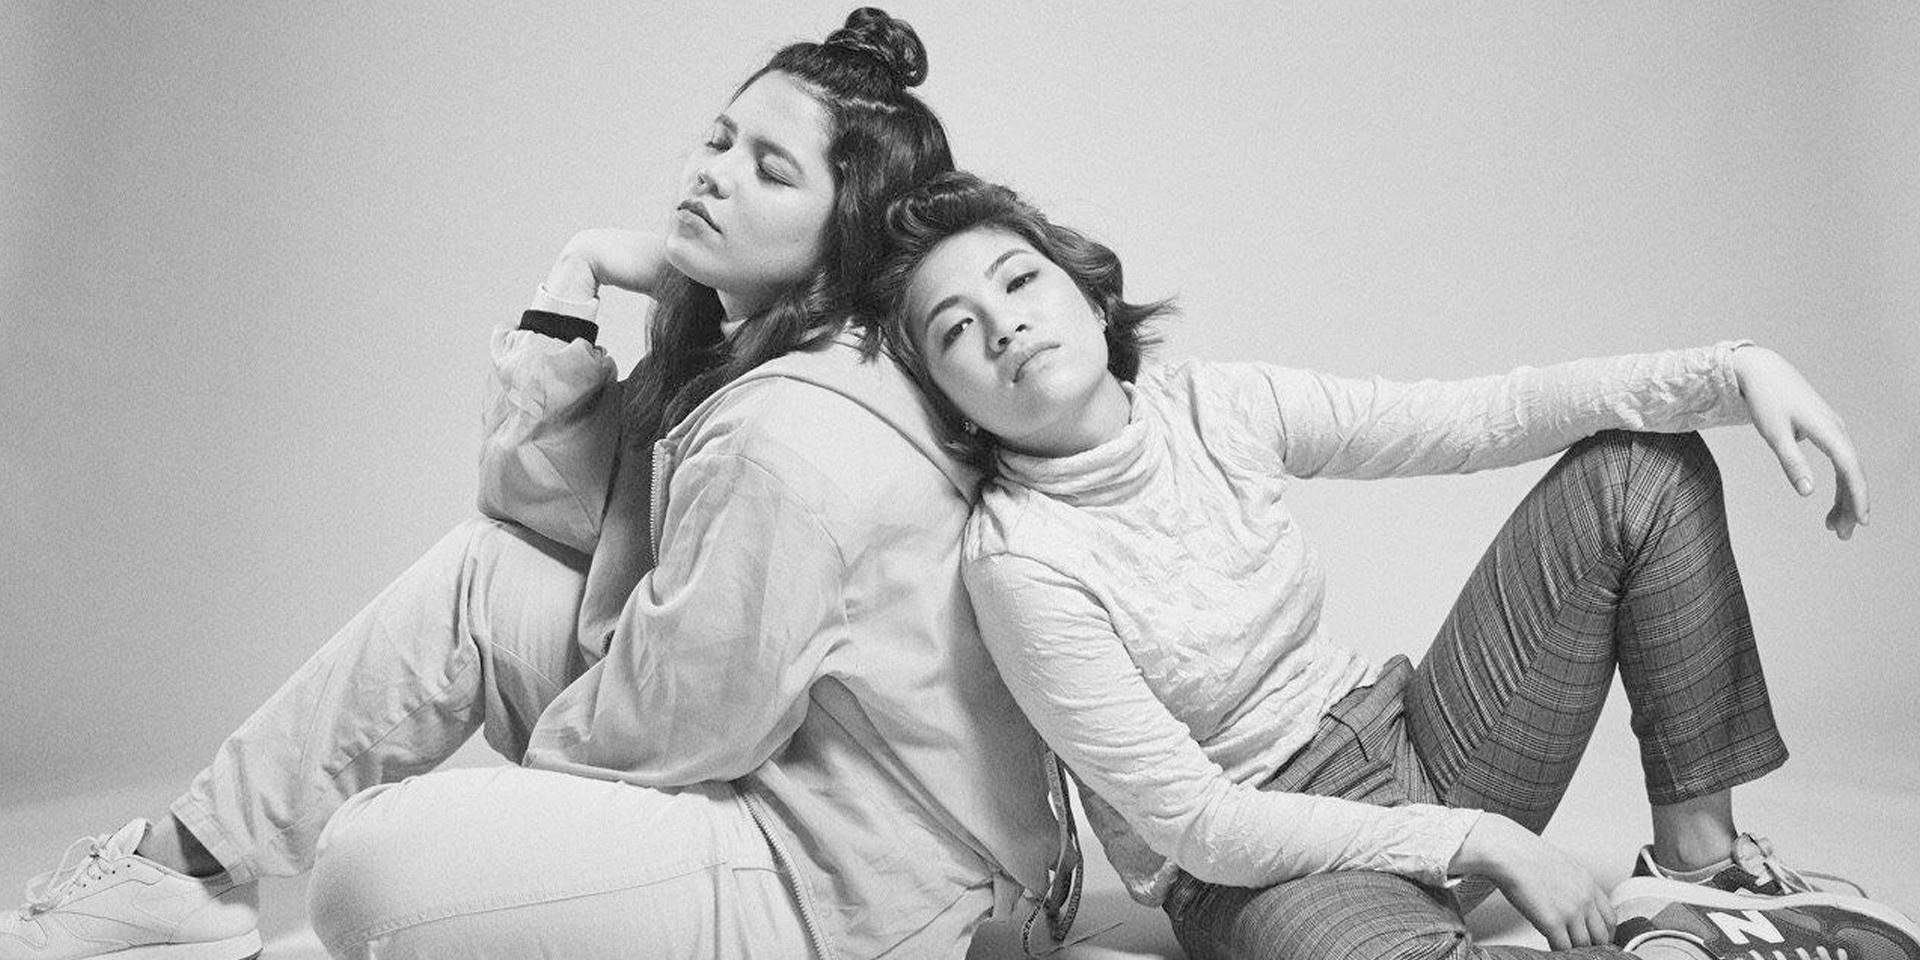 Leanne and Naara drop 'Rest' lyric video – watch